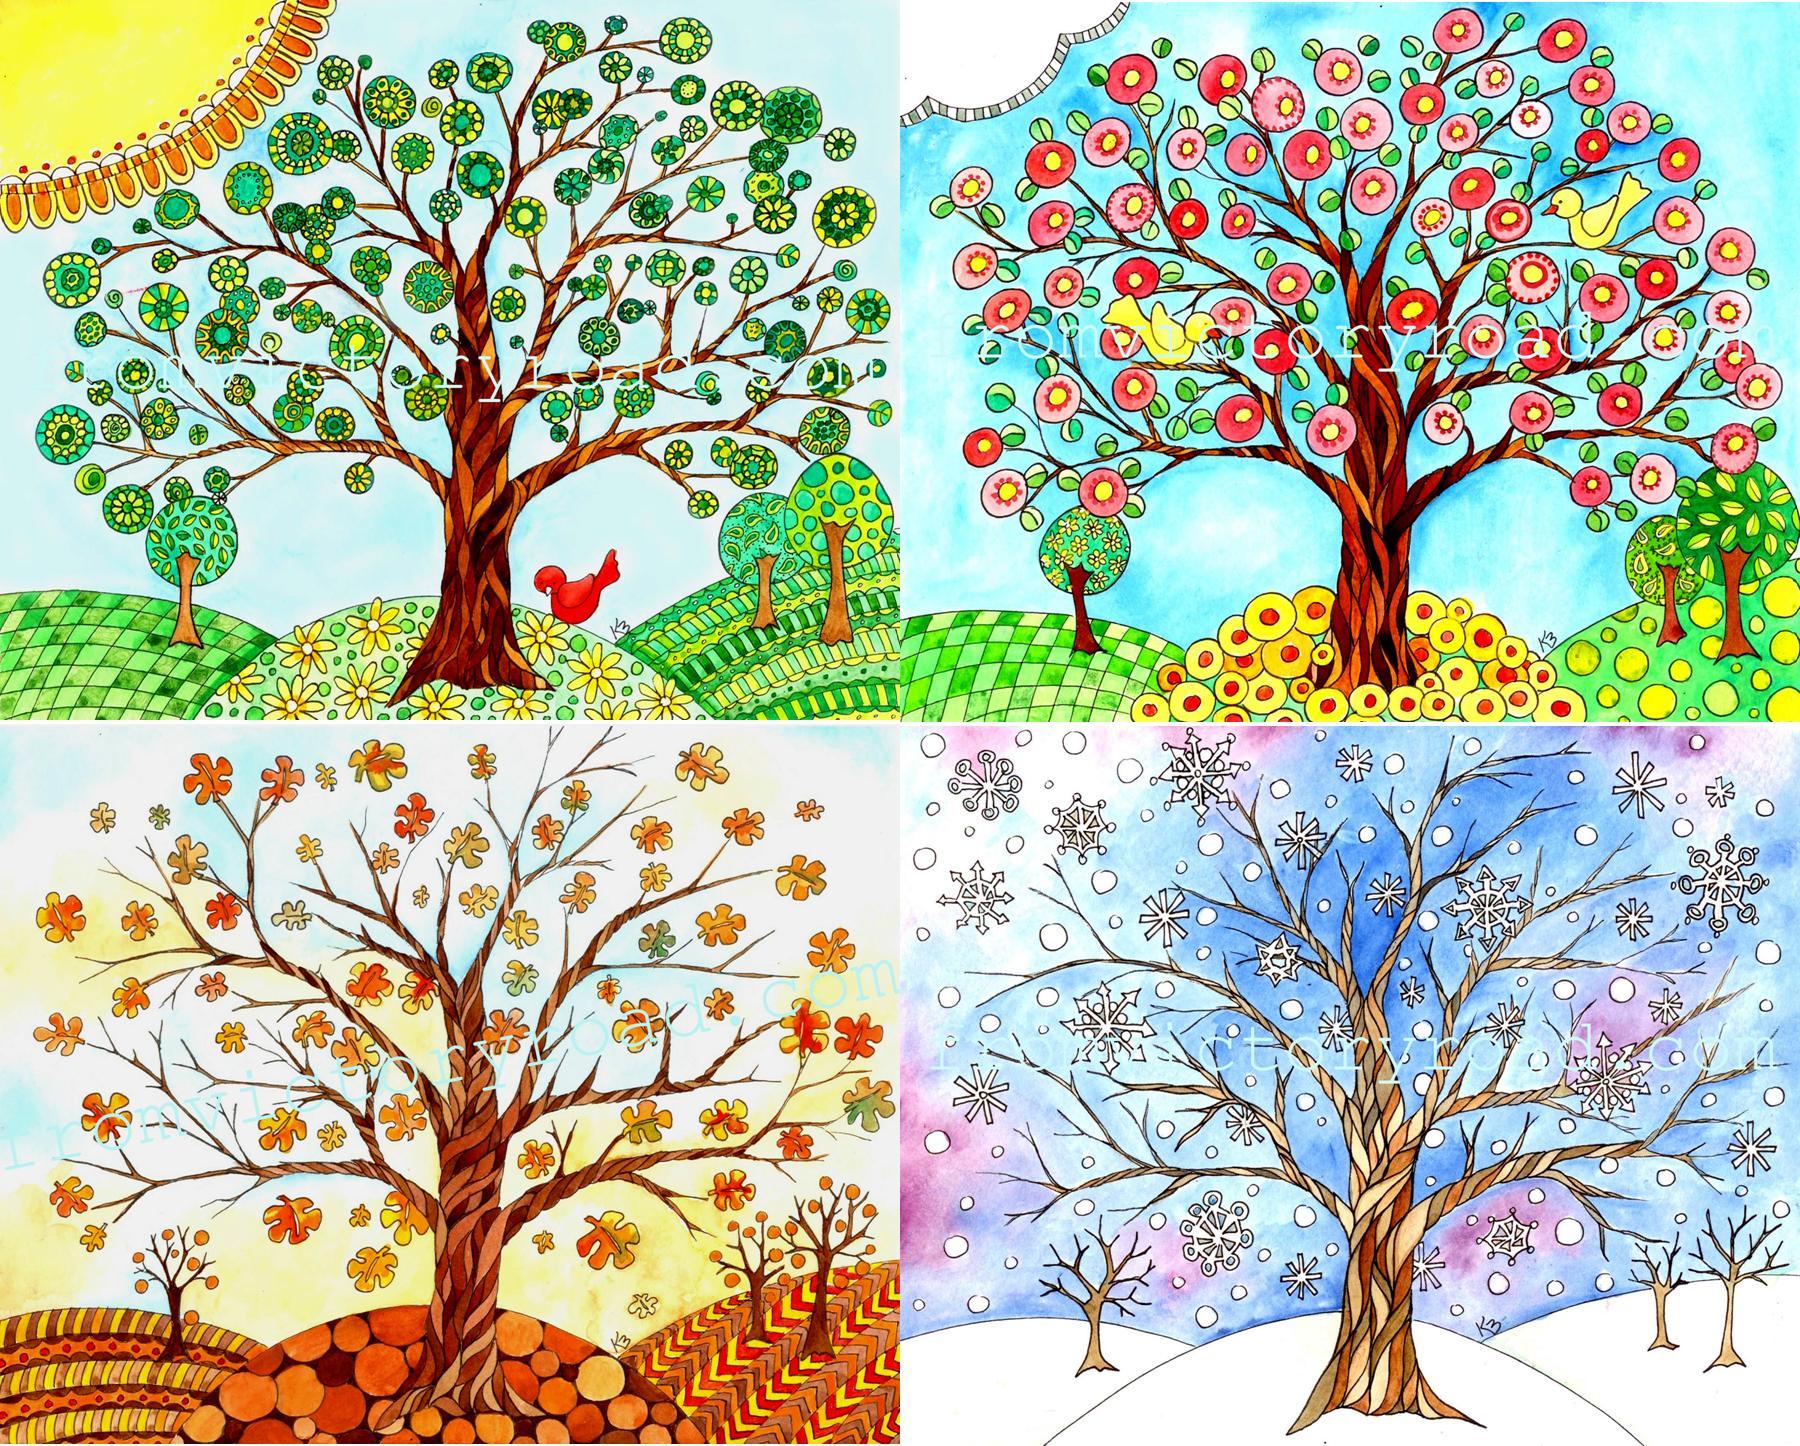 A Progression Of Trees